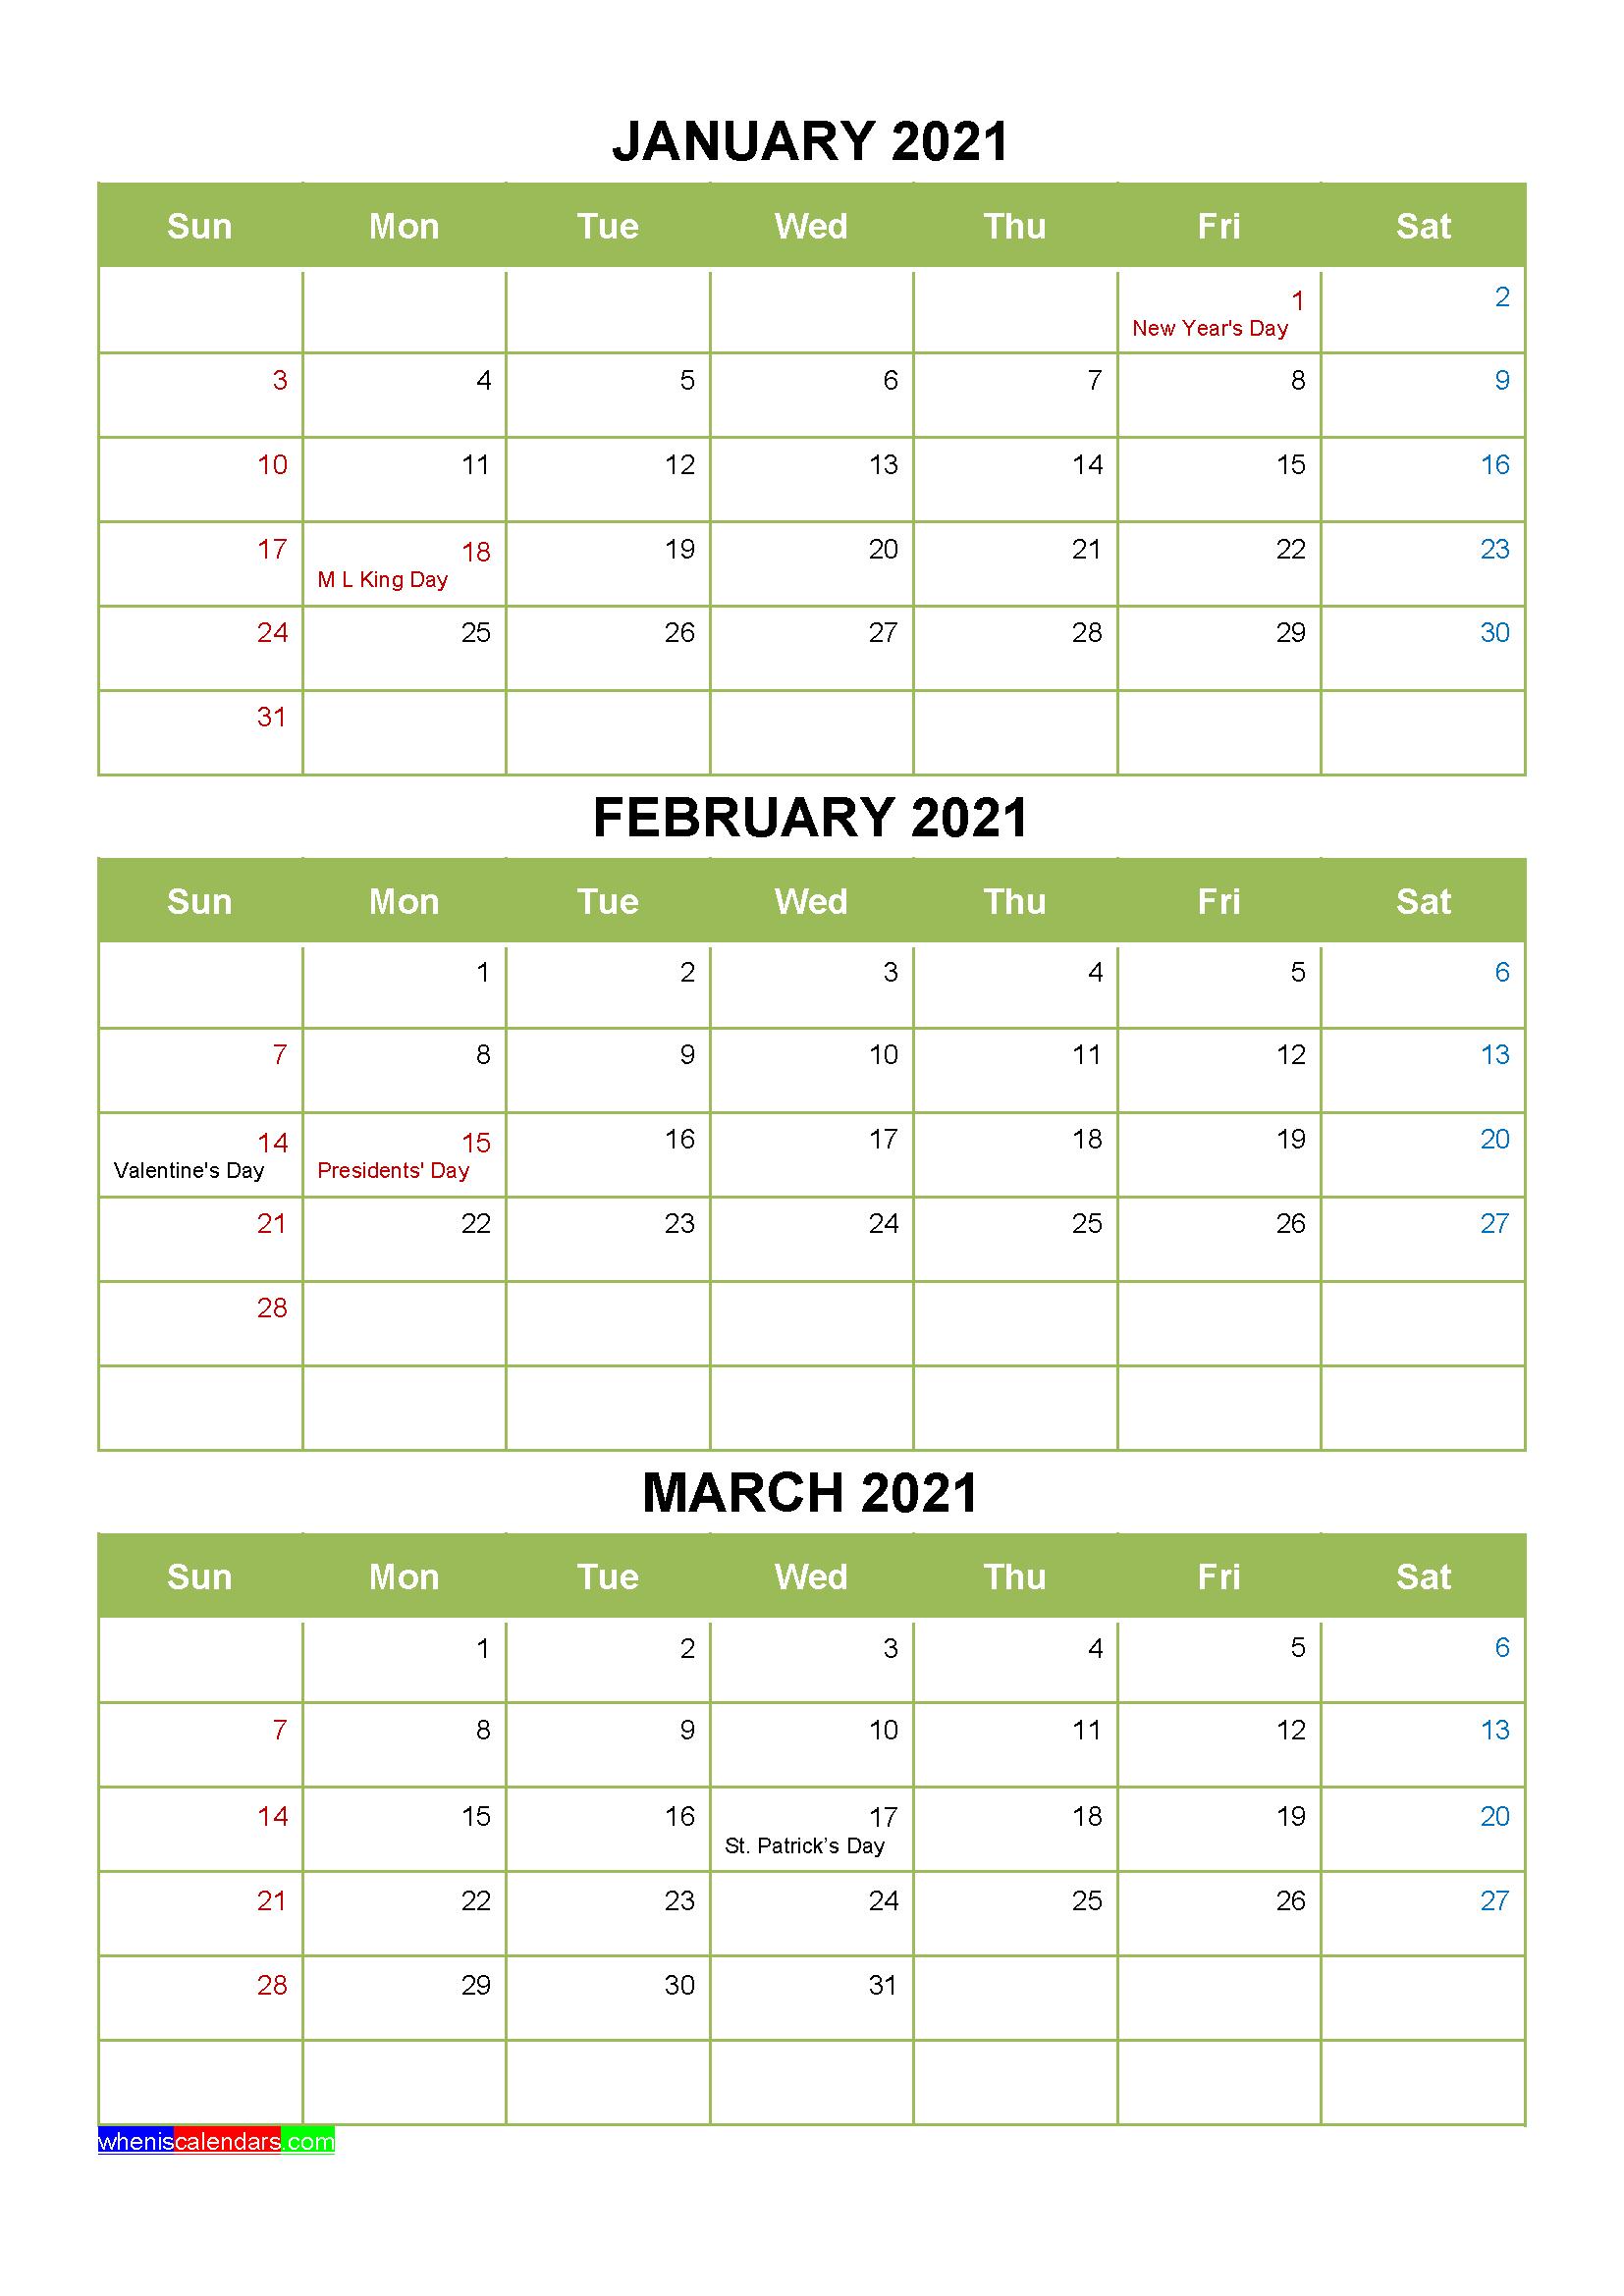 Free Printable January February March 2021 Calendar 3 regarding Printable 3 Months At A Time Calendar 2021